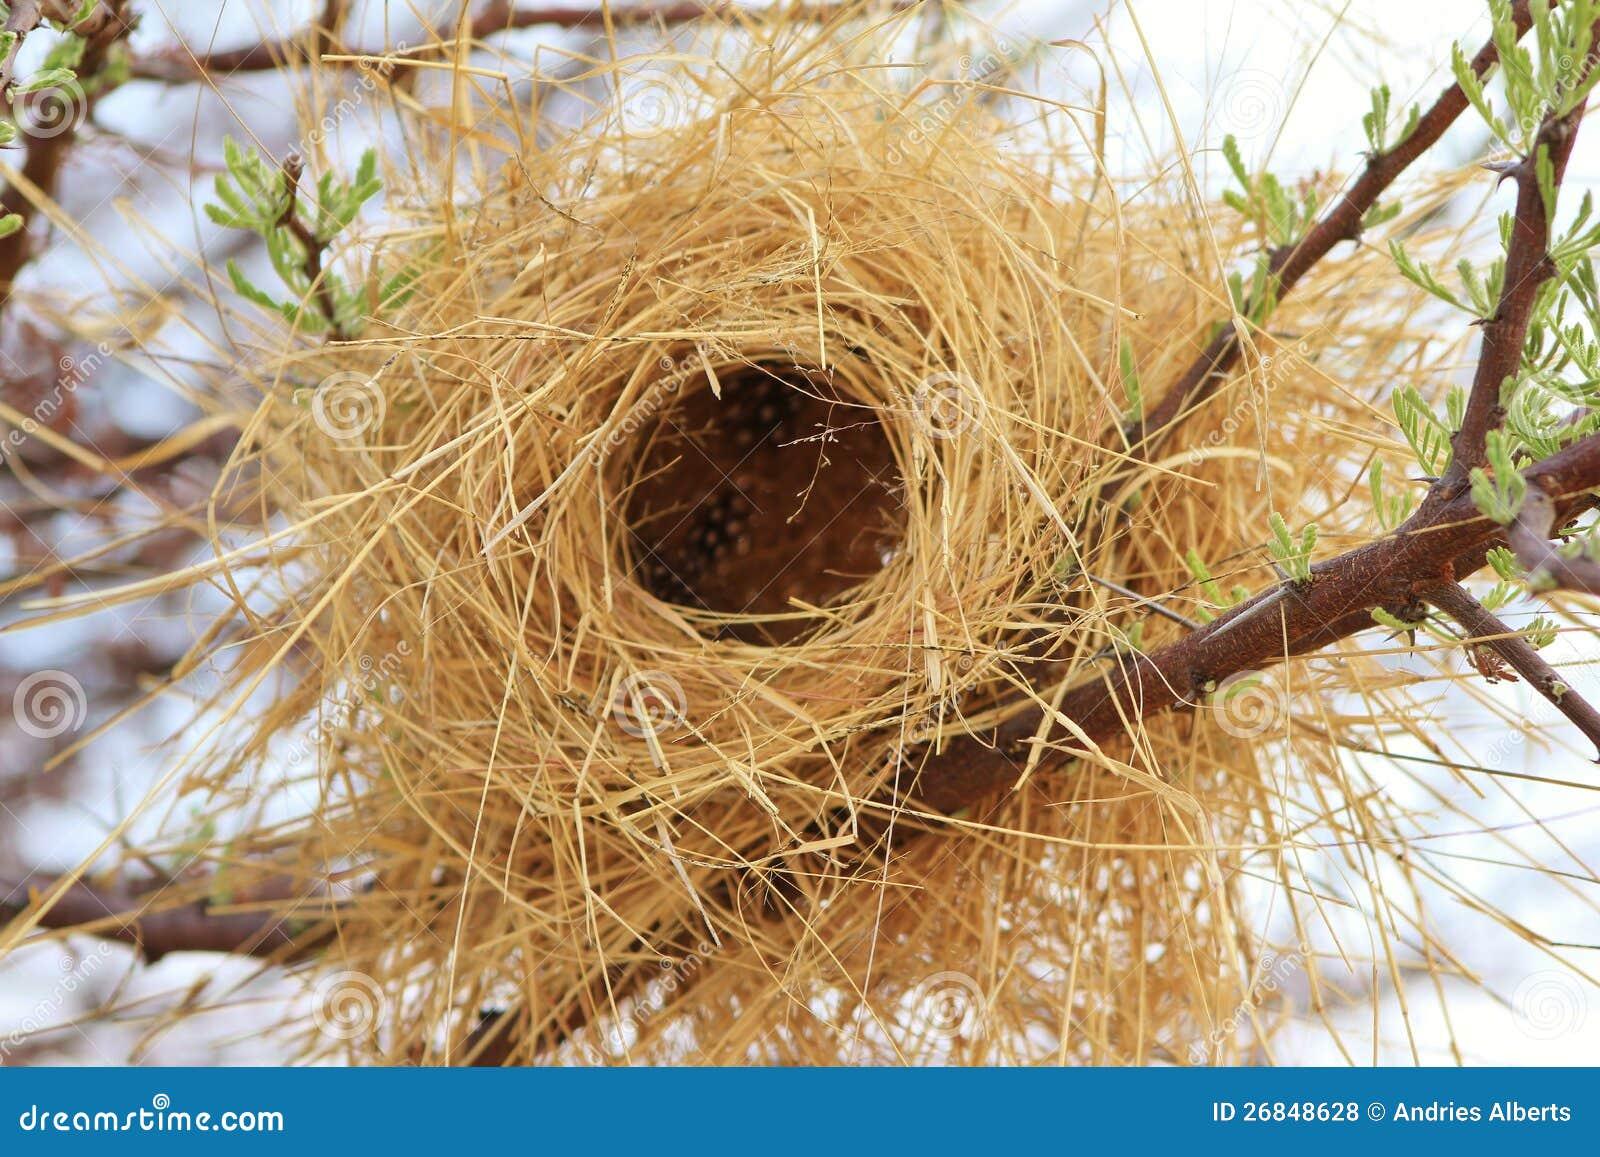 Birds Nest Buffalo Weaver Africa Royalty Free Stock